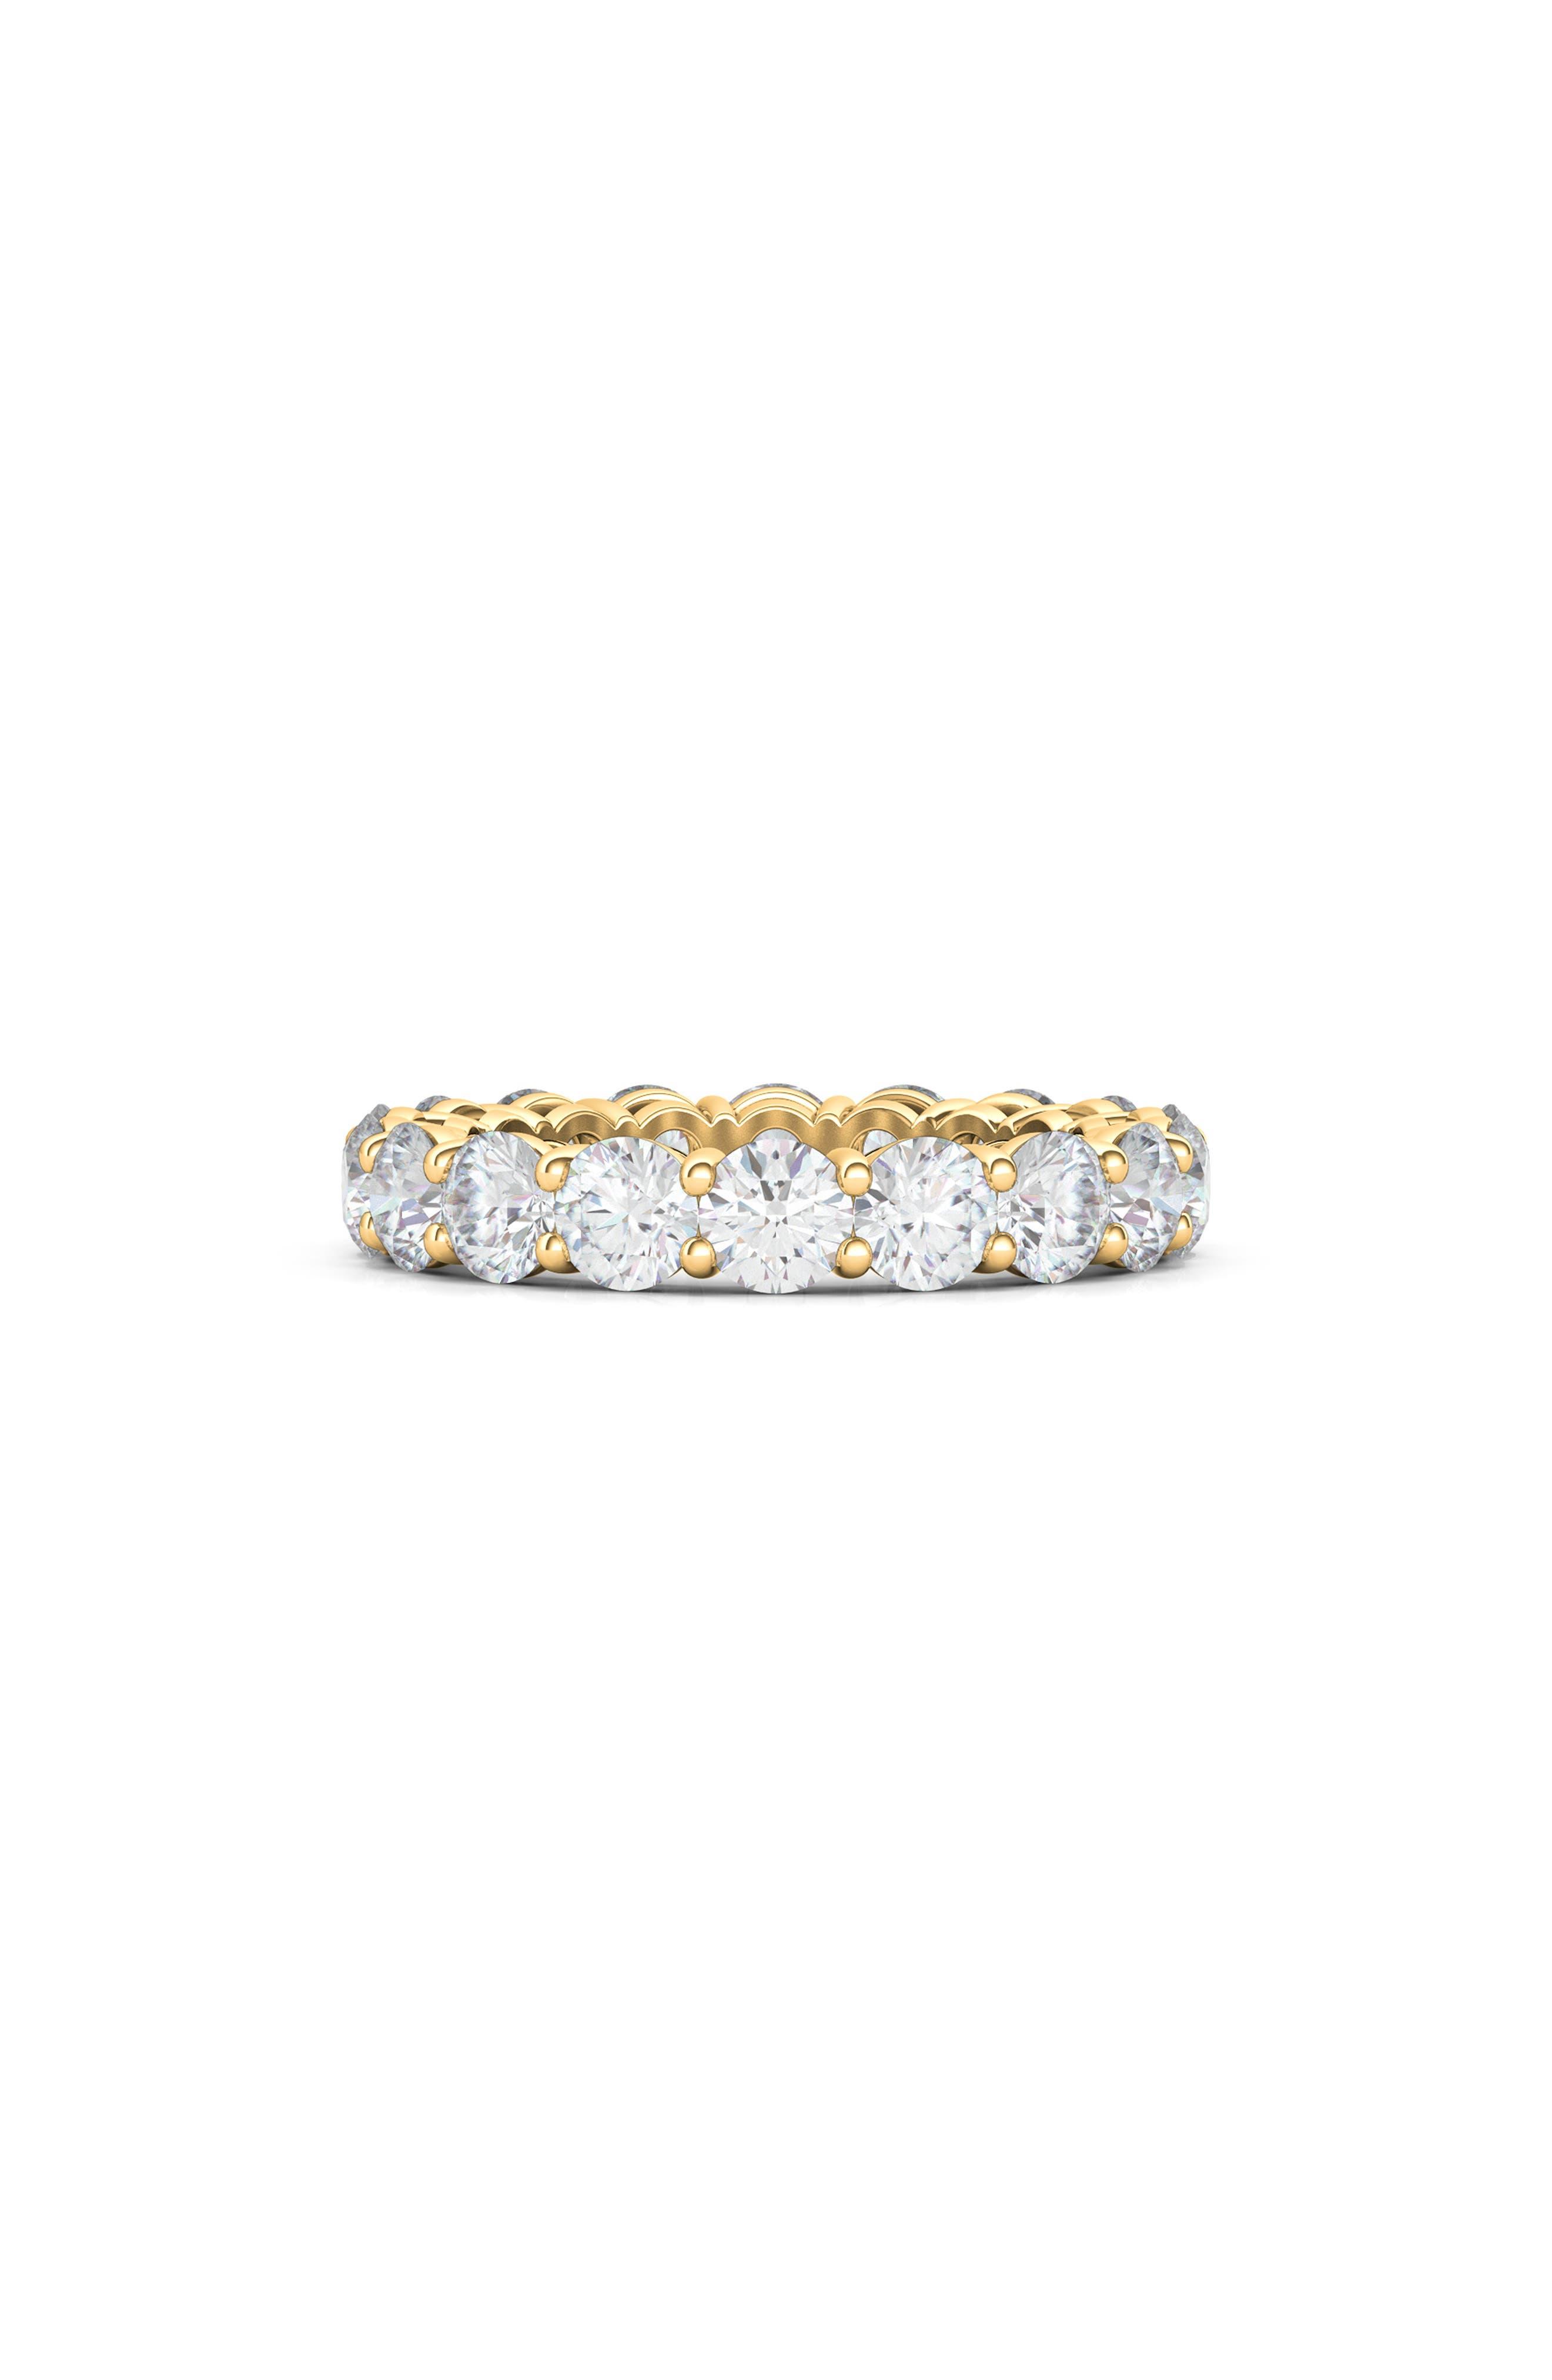 Round Cut 5.60Ct Lab Created Diamond 18K Gold Eternity Band Ring